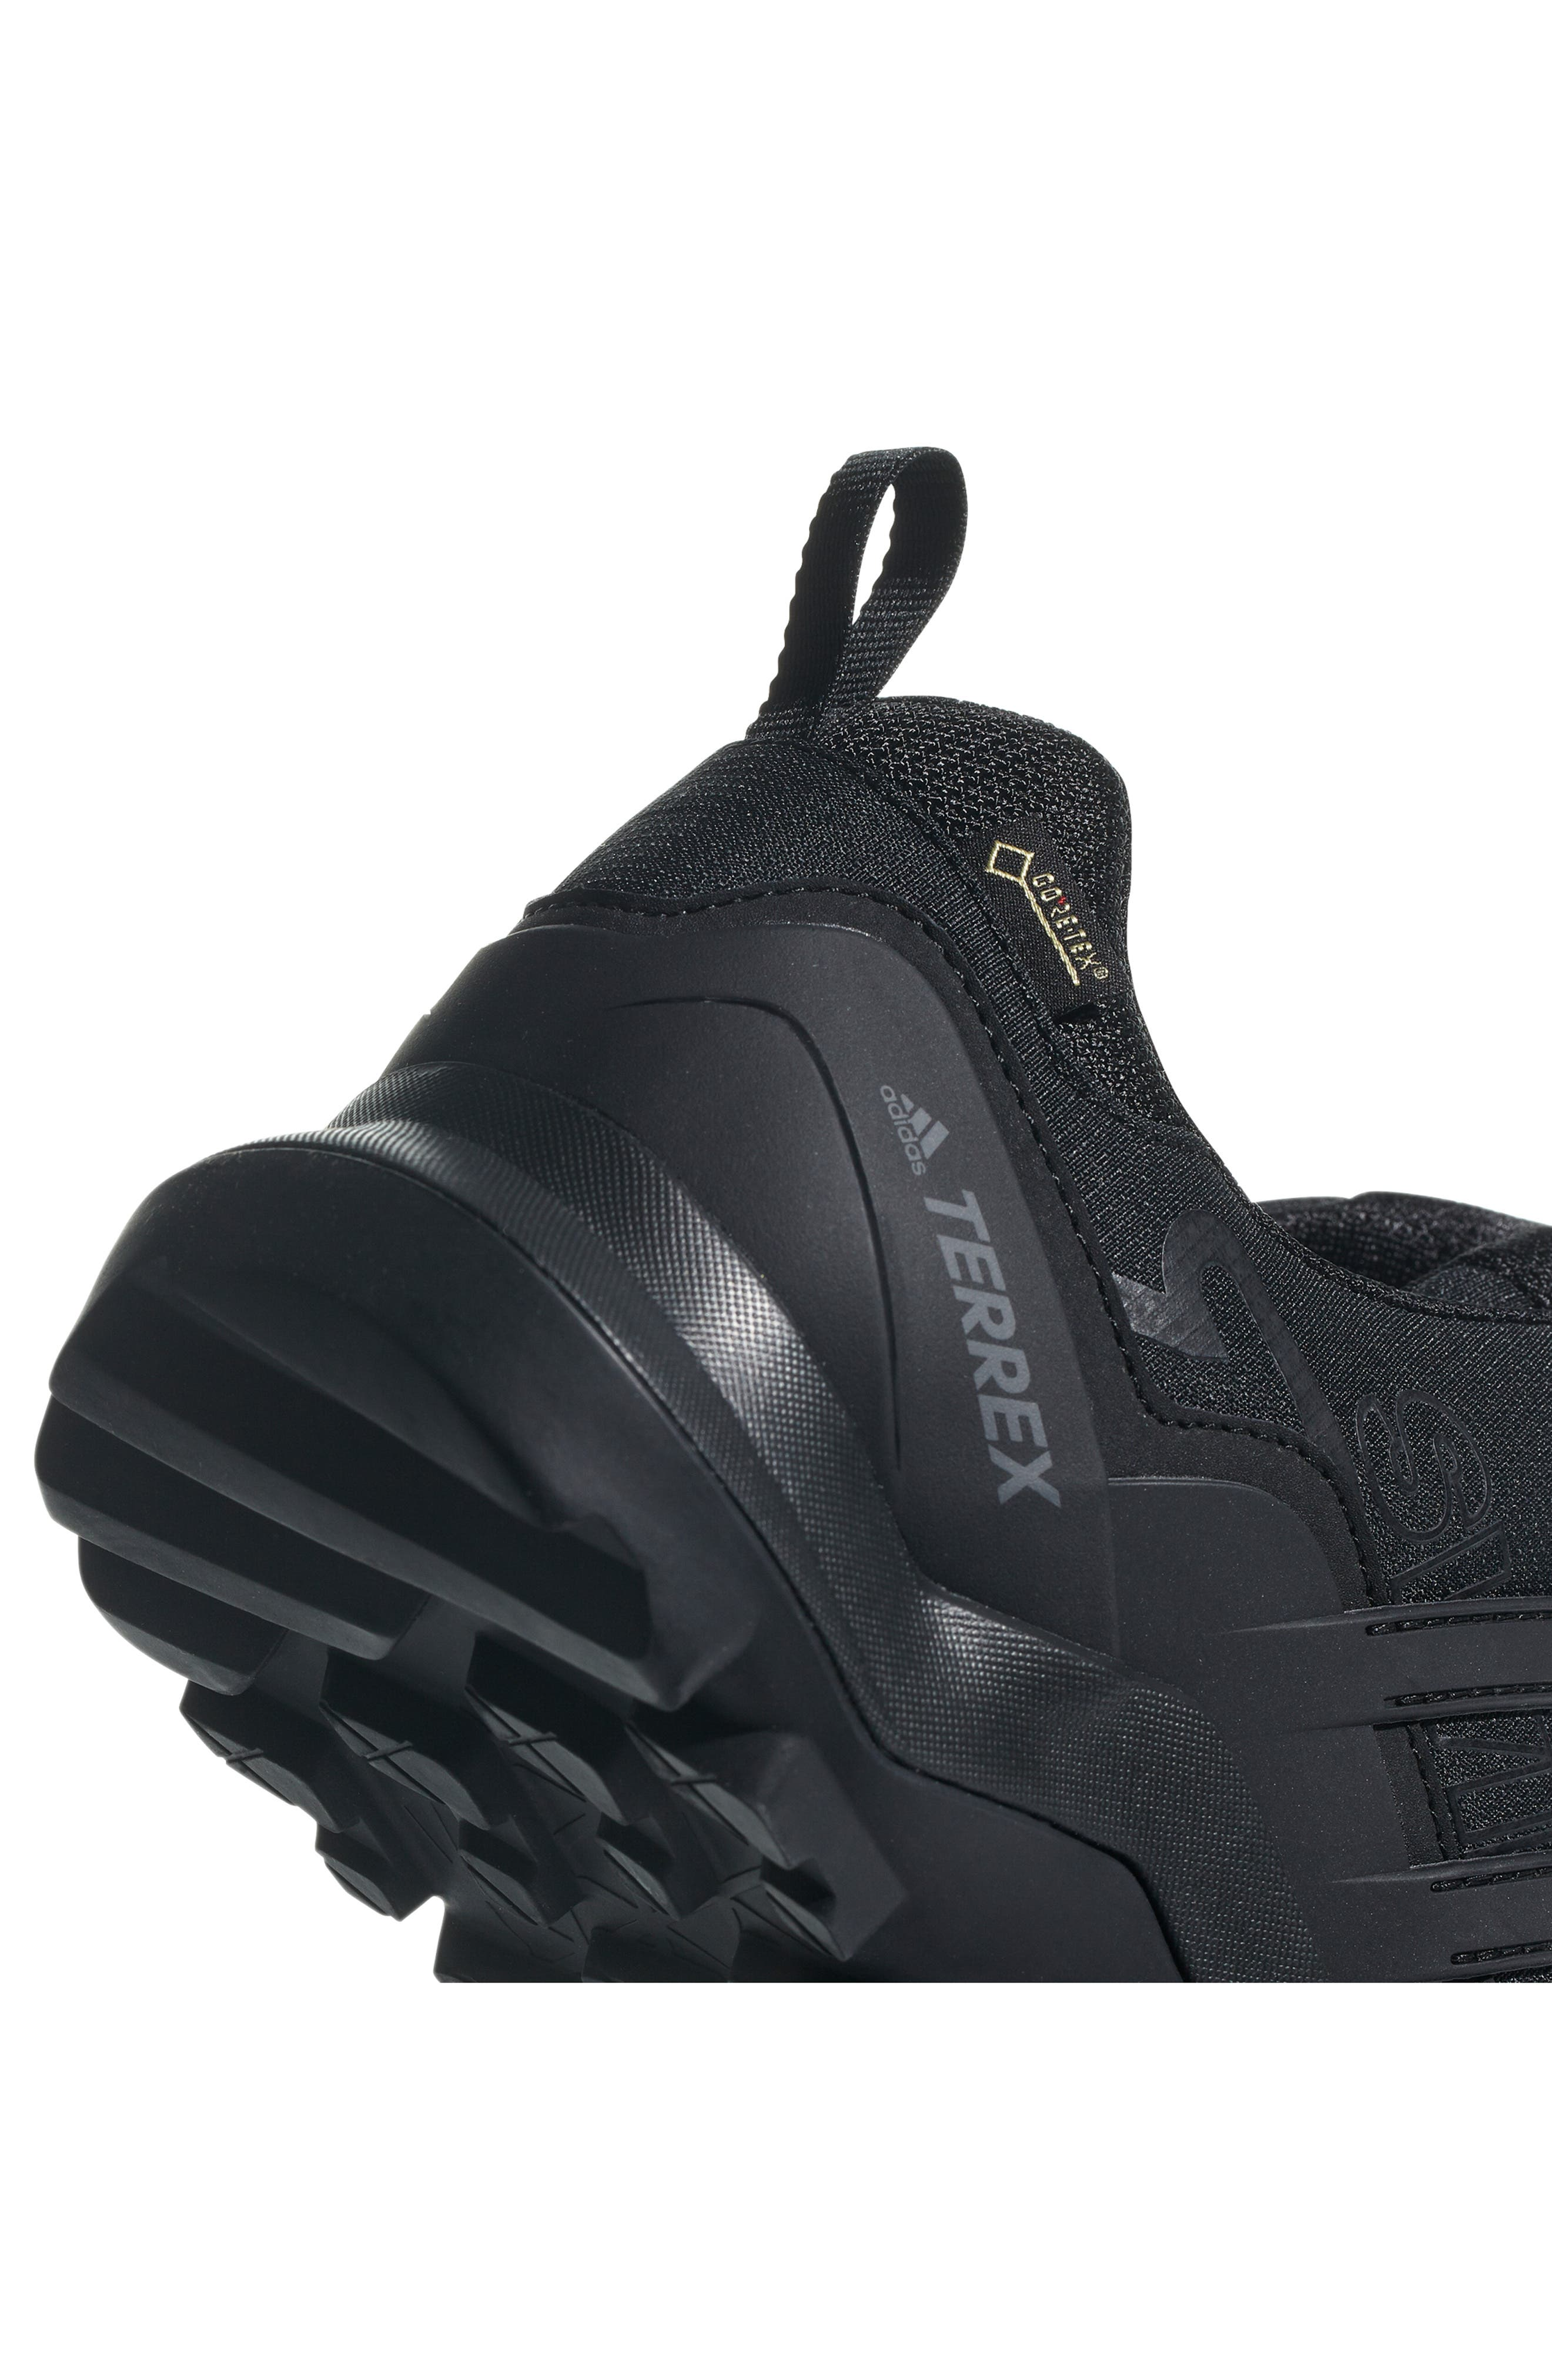 ADIDAS,                             Terrex Swift R2 GTX Gore-Tex<sup>®</sup> Waterproof Hiking Shoe,                             Alternate thumbnail 9, color,                             BLACK/ BLACK/ BLACK